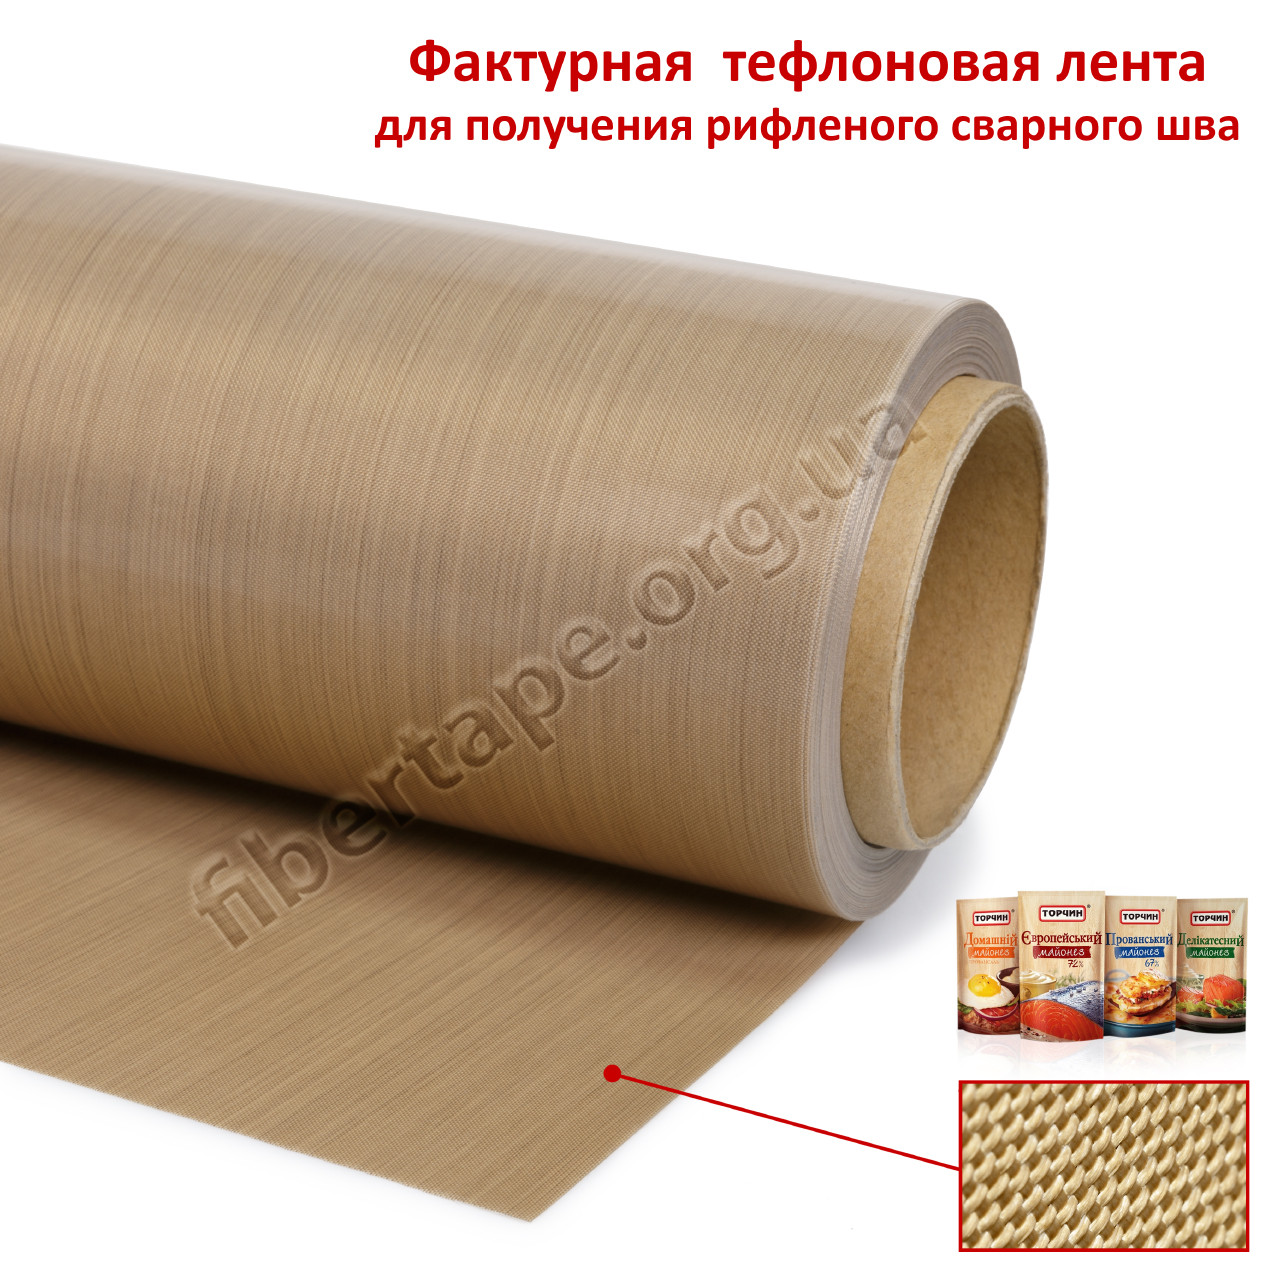 Тефлоновая лента (пленка) с порами 230 микрон